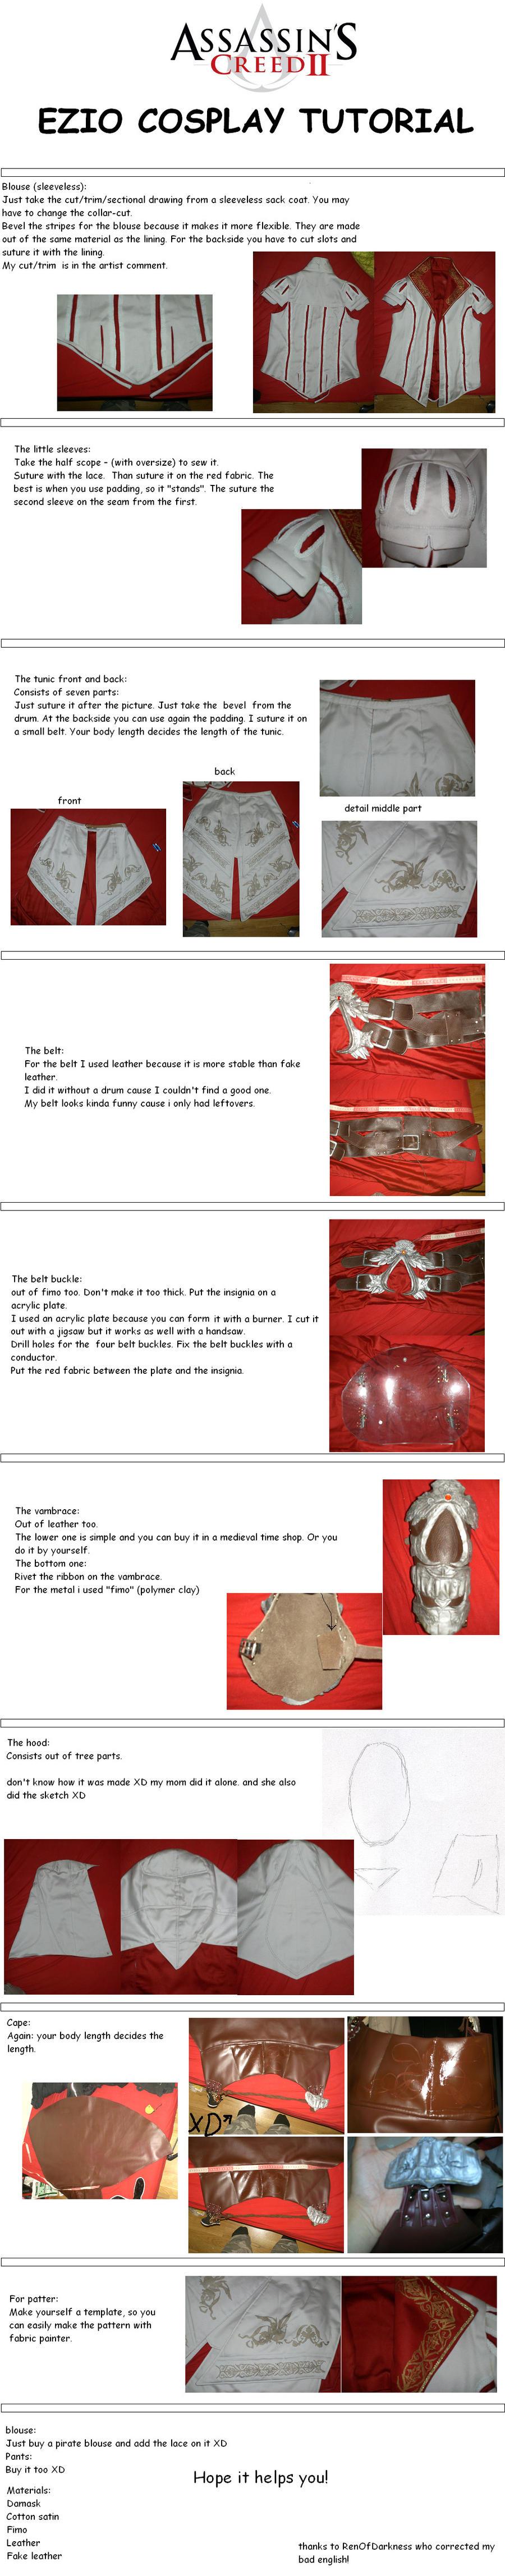 EZIO COSPLAY TUTORIAL -ENGLISH by LadyBad